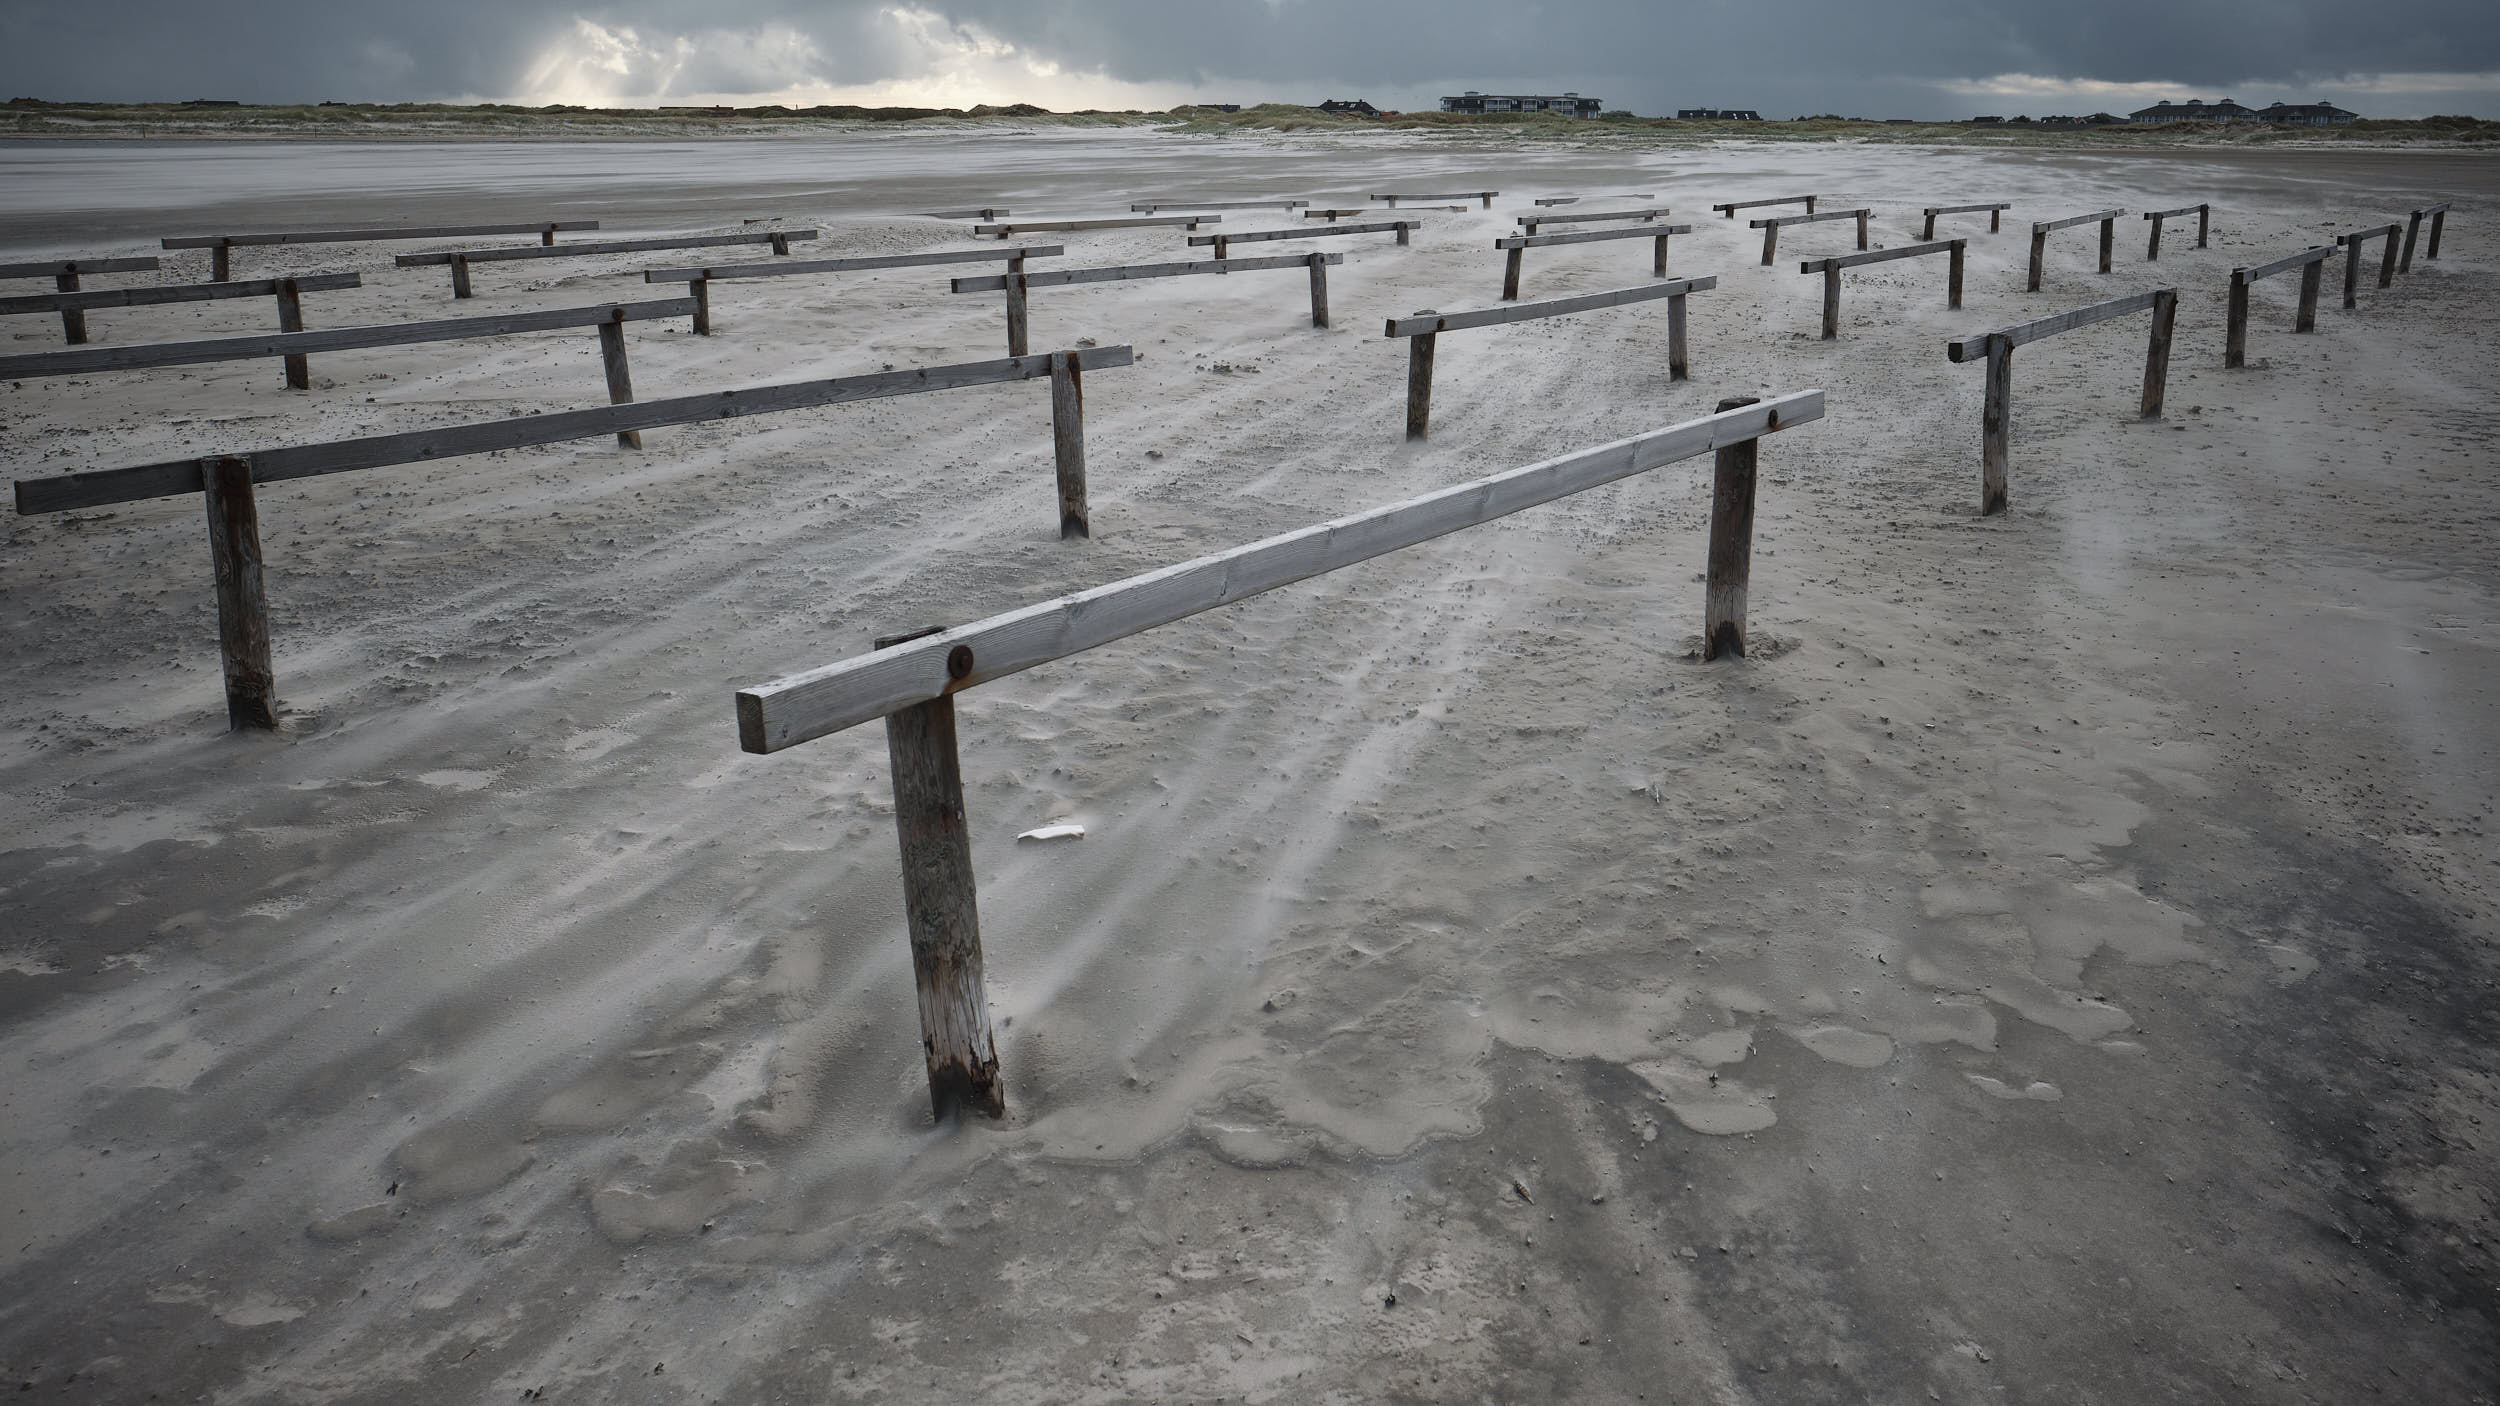 Sand, Fahrradständer Strand Sankt-Peter-Ording